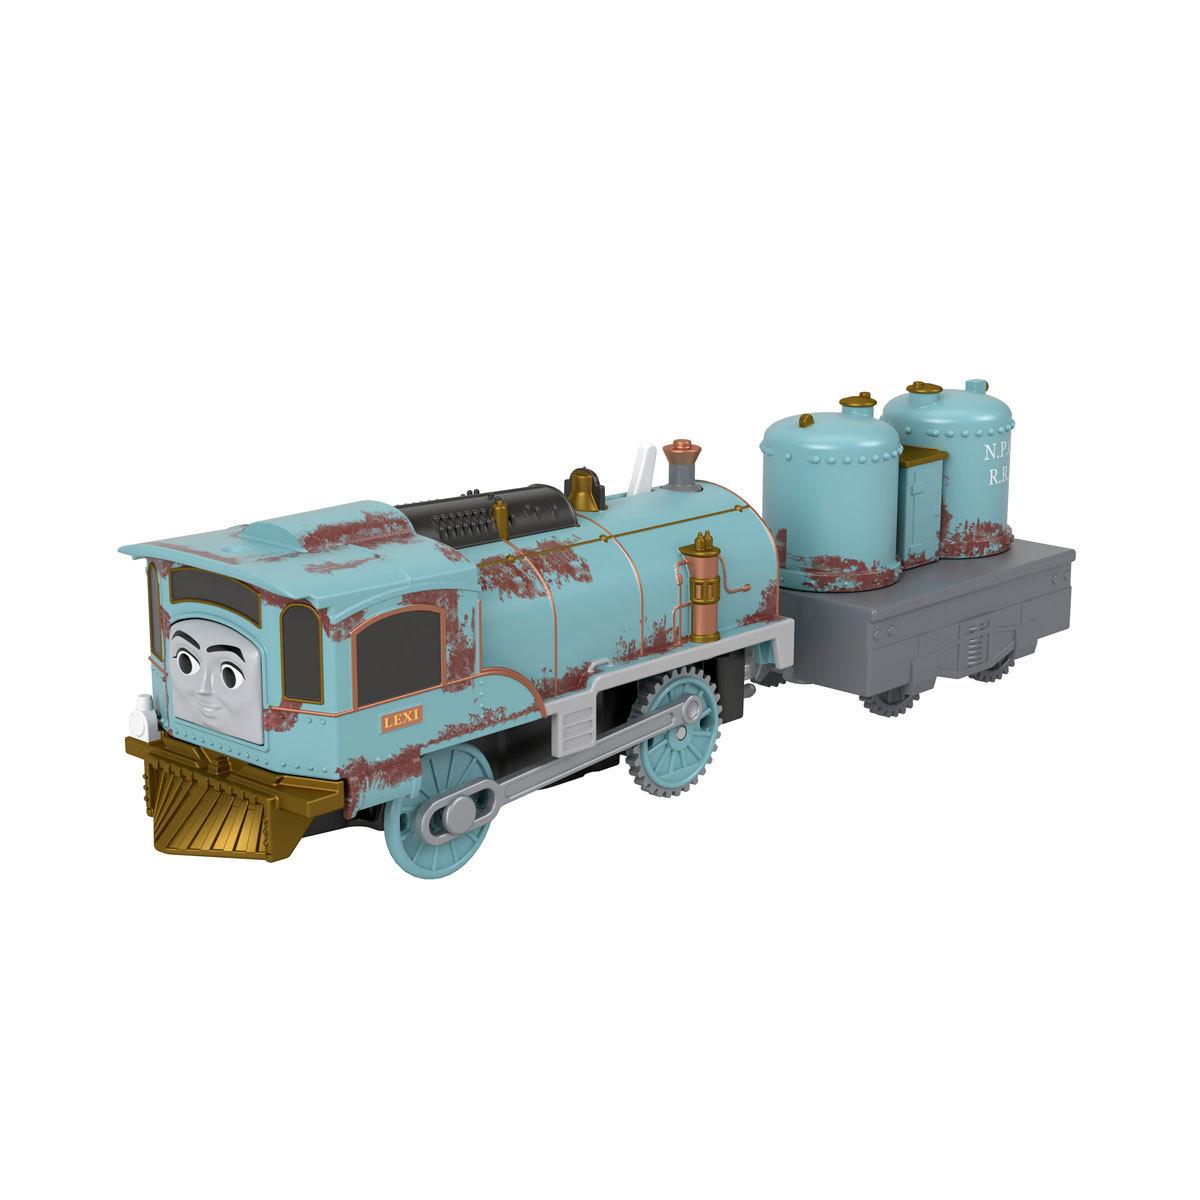 Fisher-Price Thomas & Friends Motorized Train - Lexi the Experimental